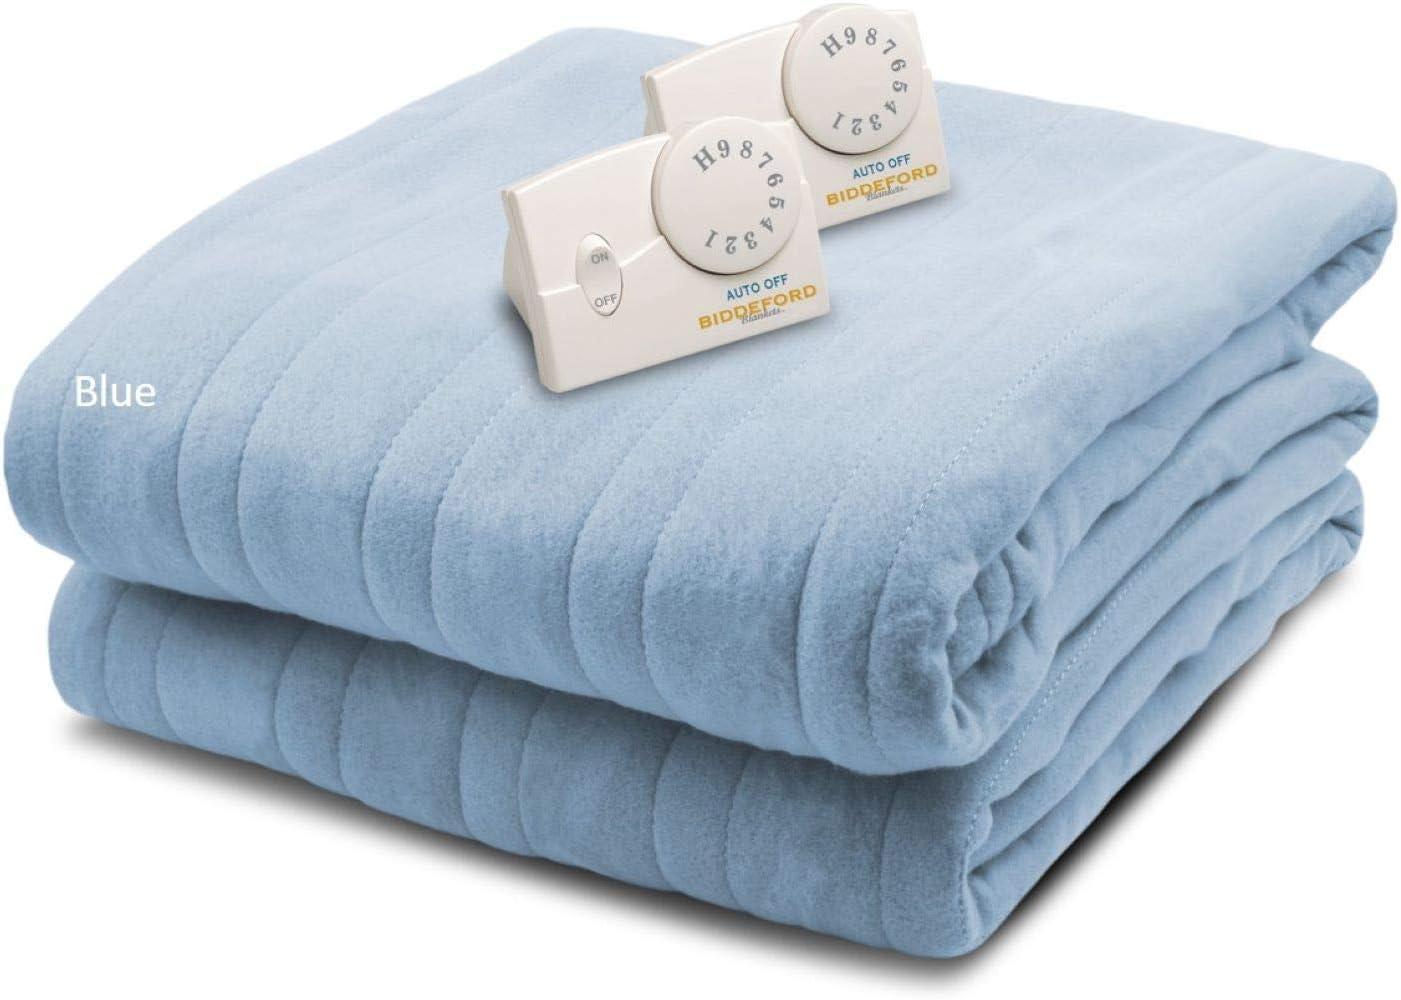 Biddeford Blankets Comfort Knit Heated Blanket, King, Cloud Blue